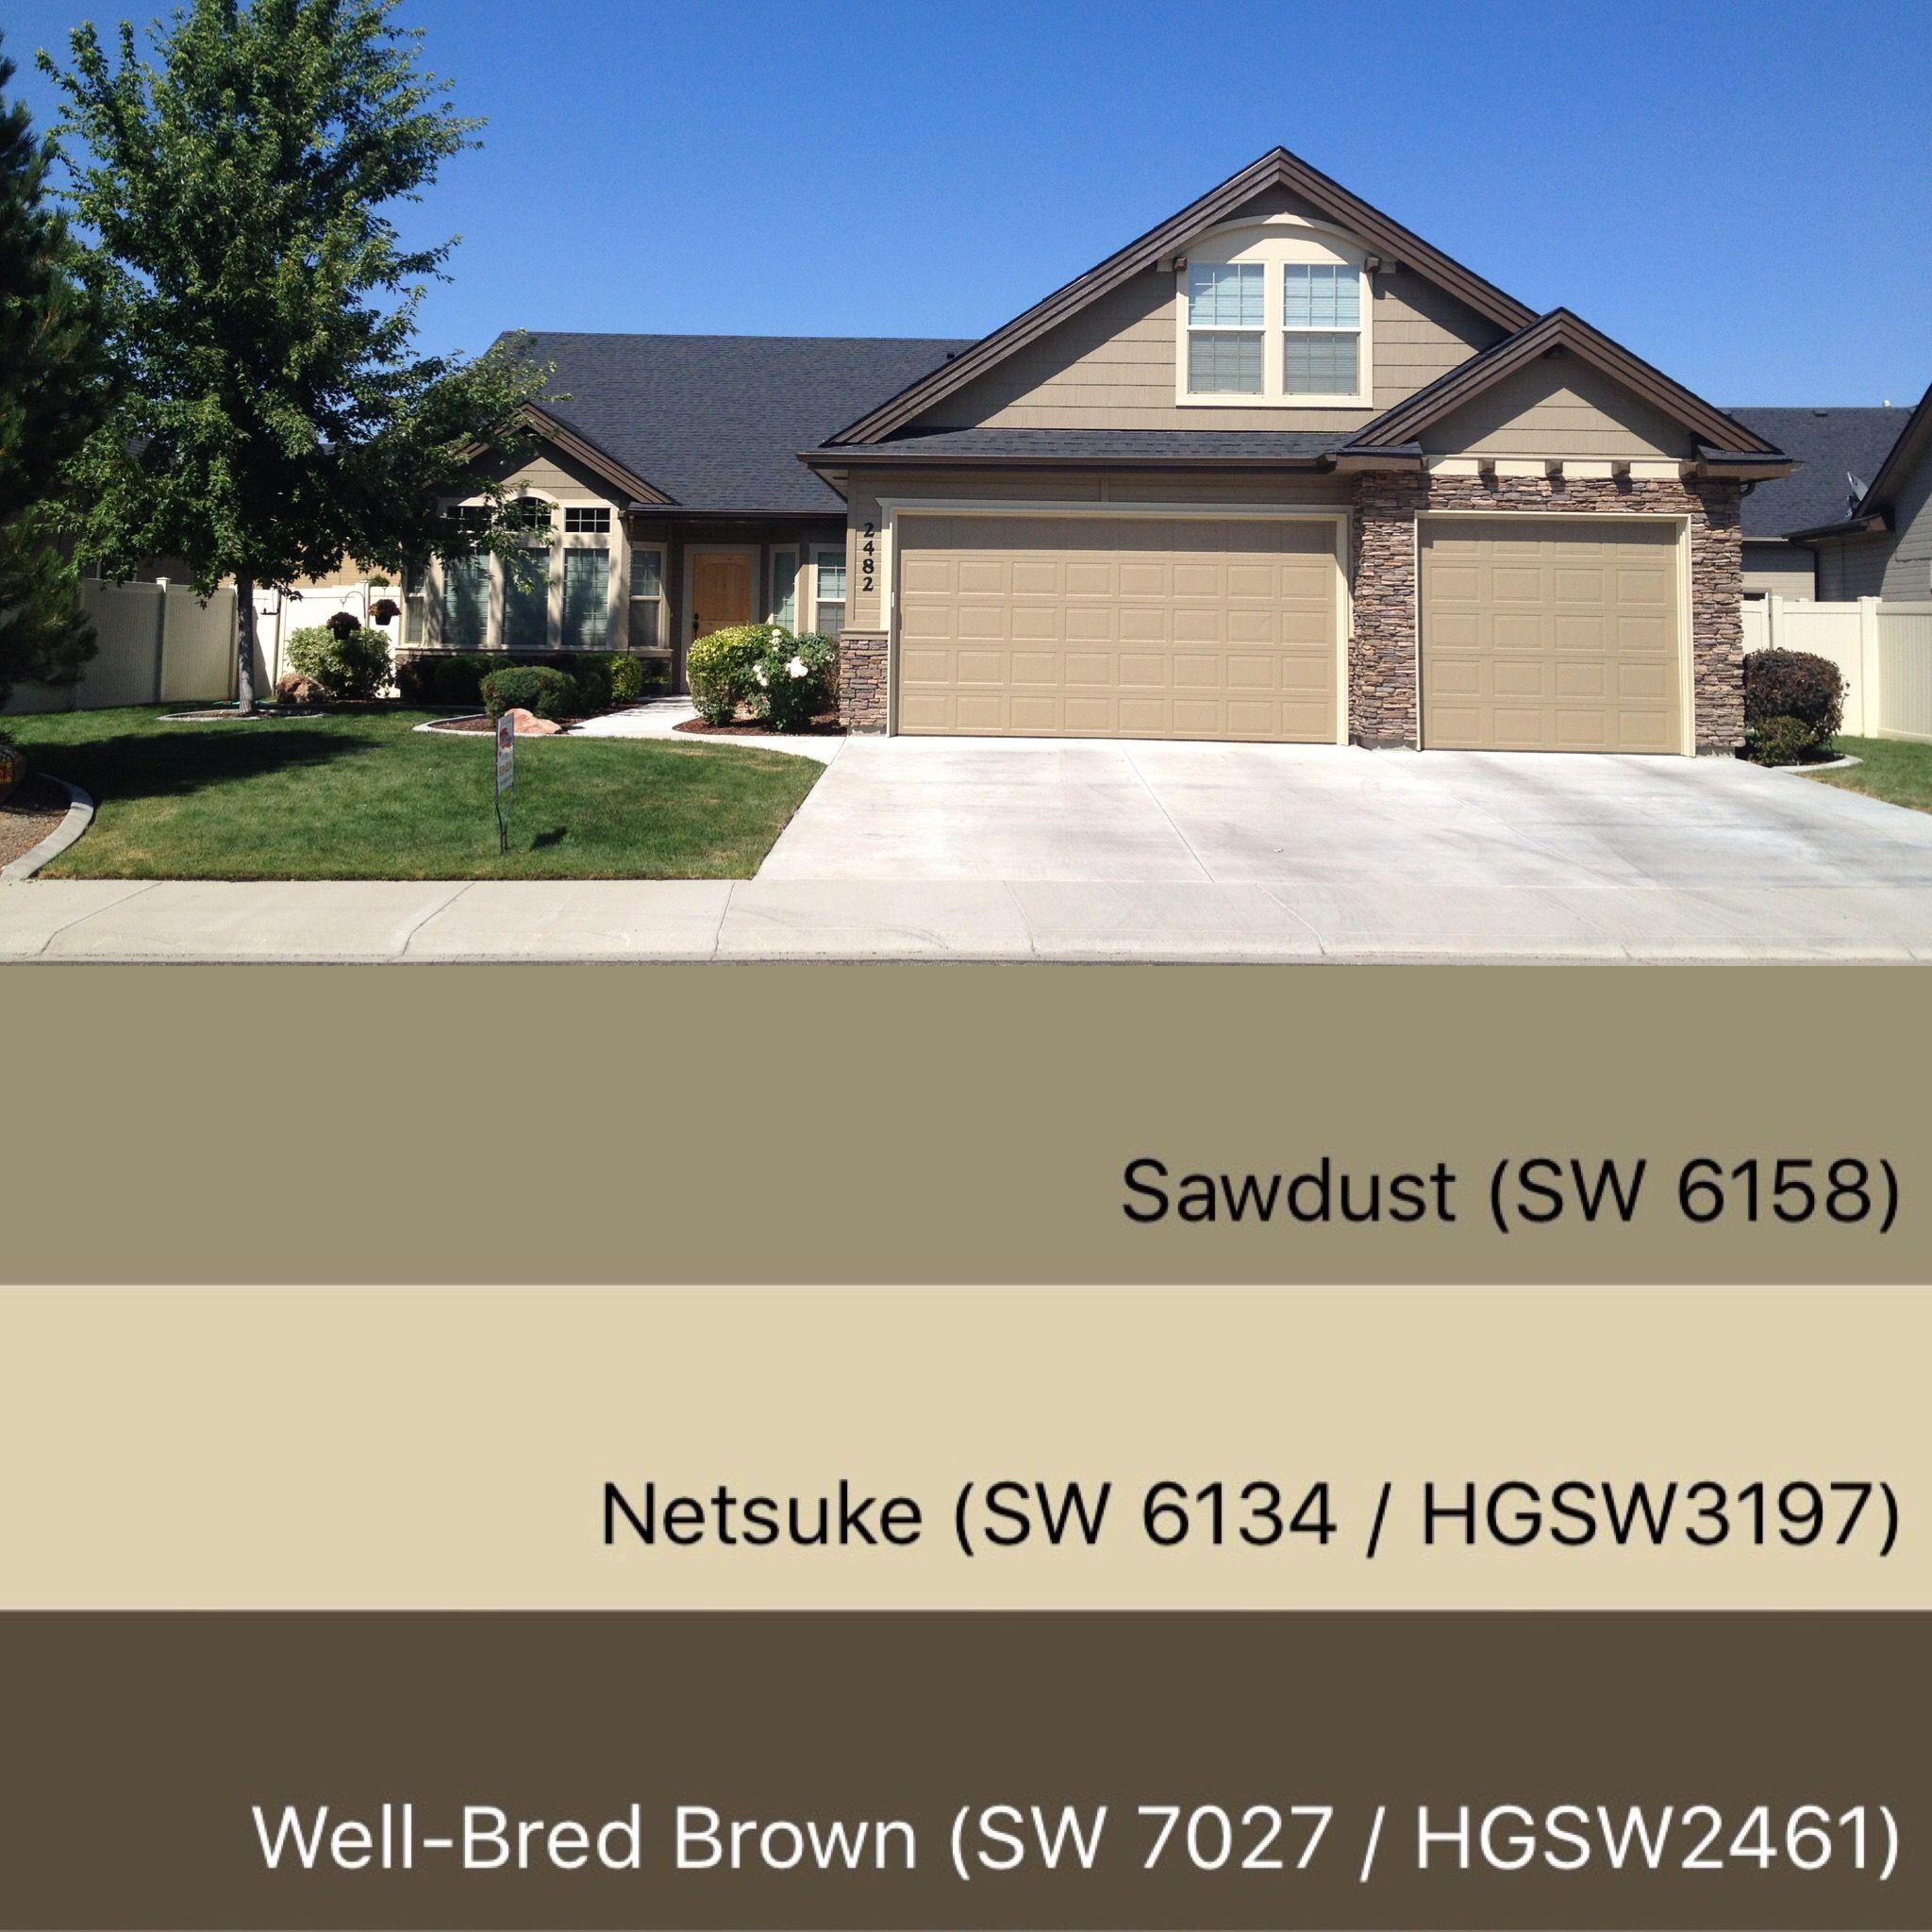 Sherwin williams paint colors sawdust 6158 netsuke 6134 for Color de pintura al aire libre casa moderna